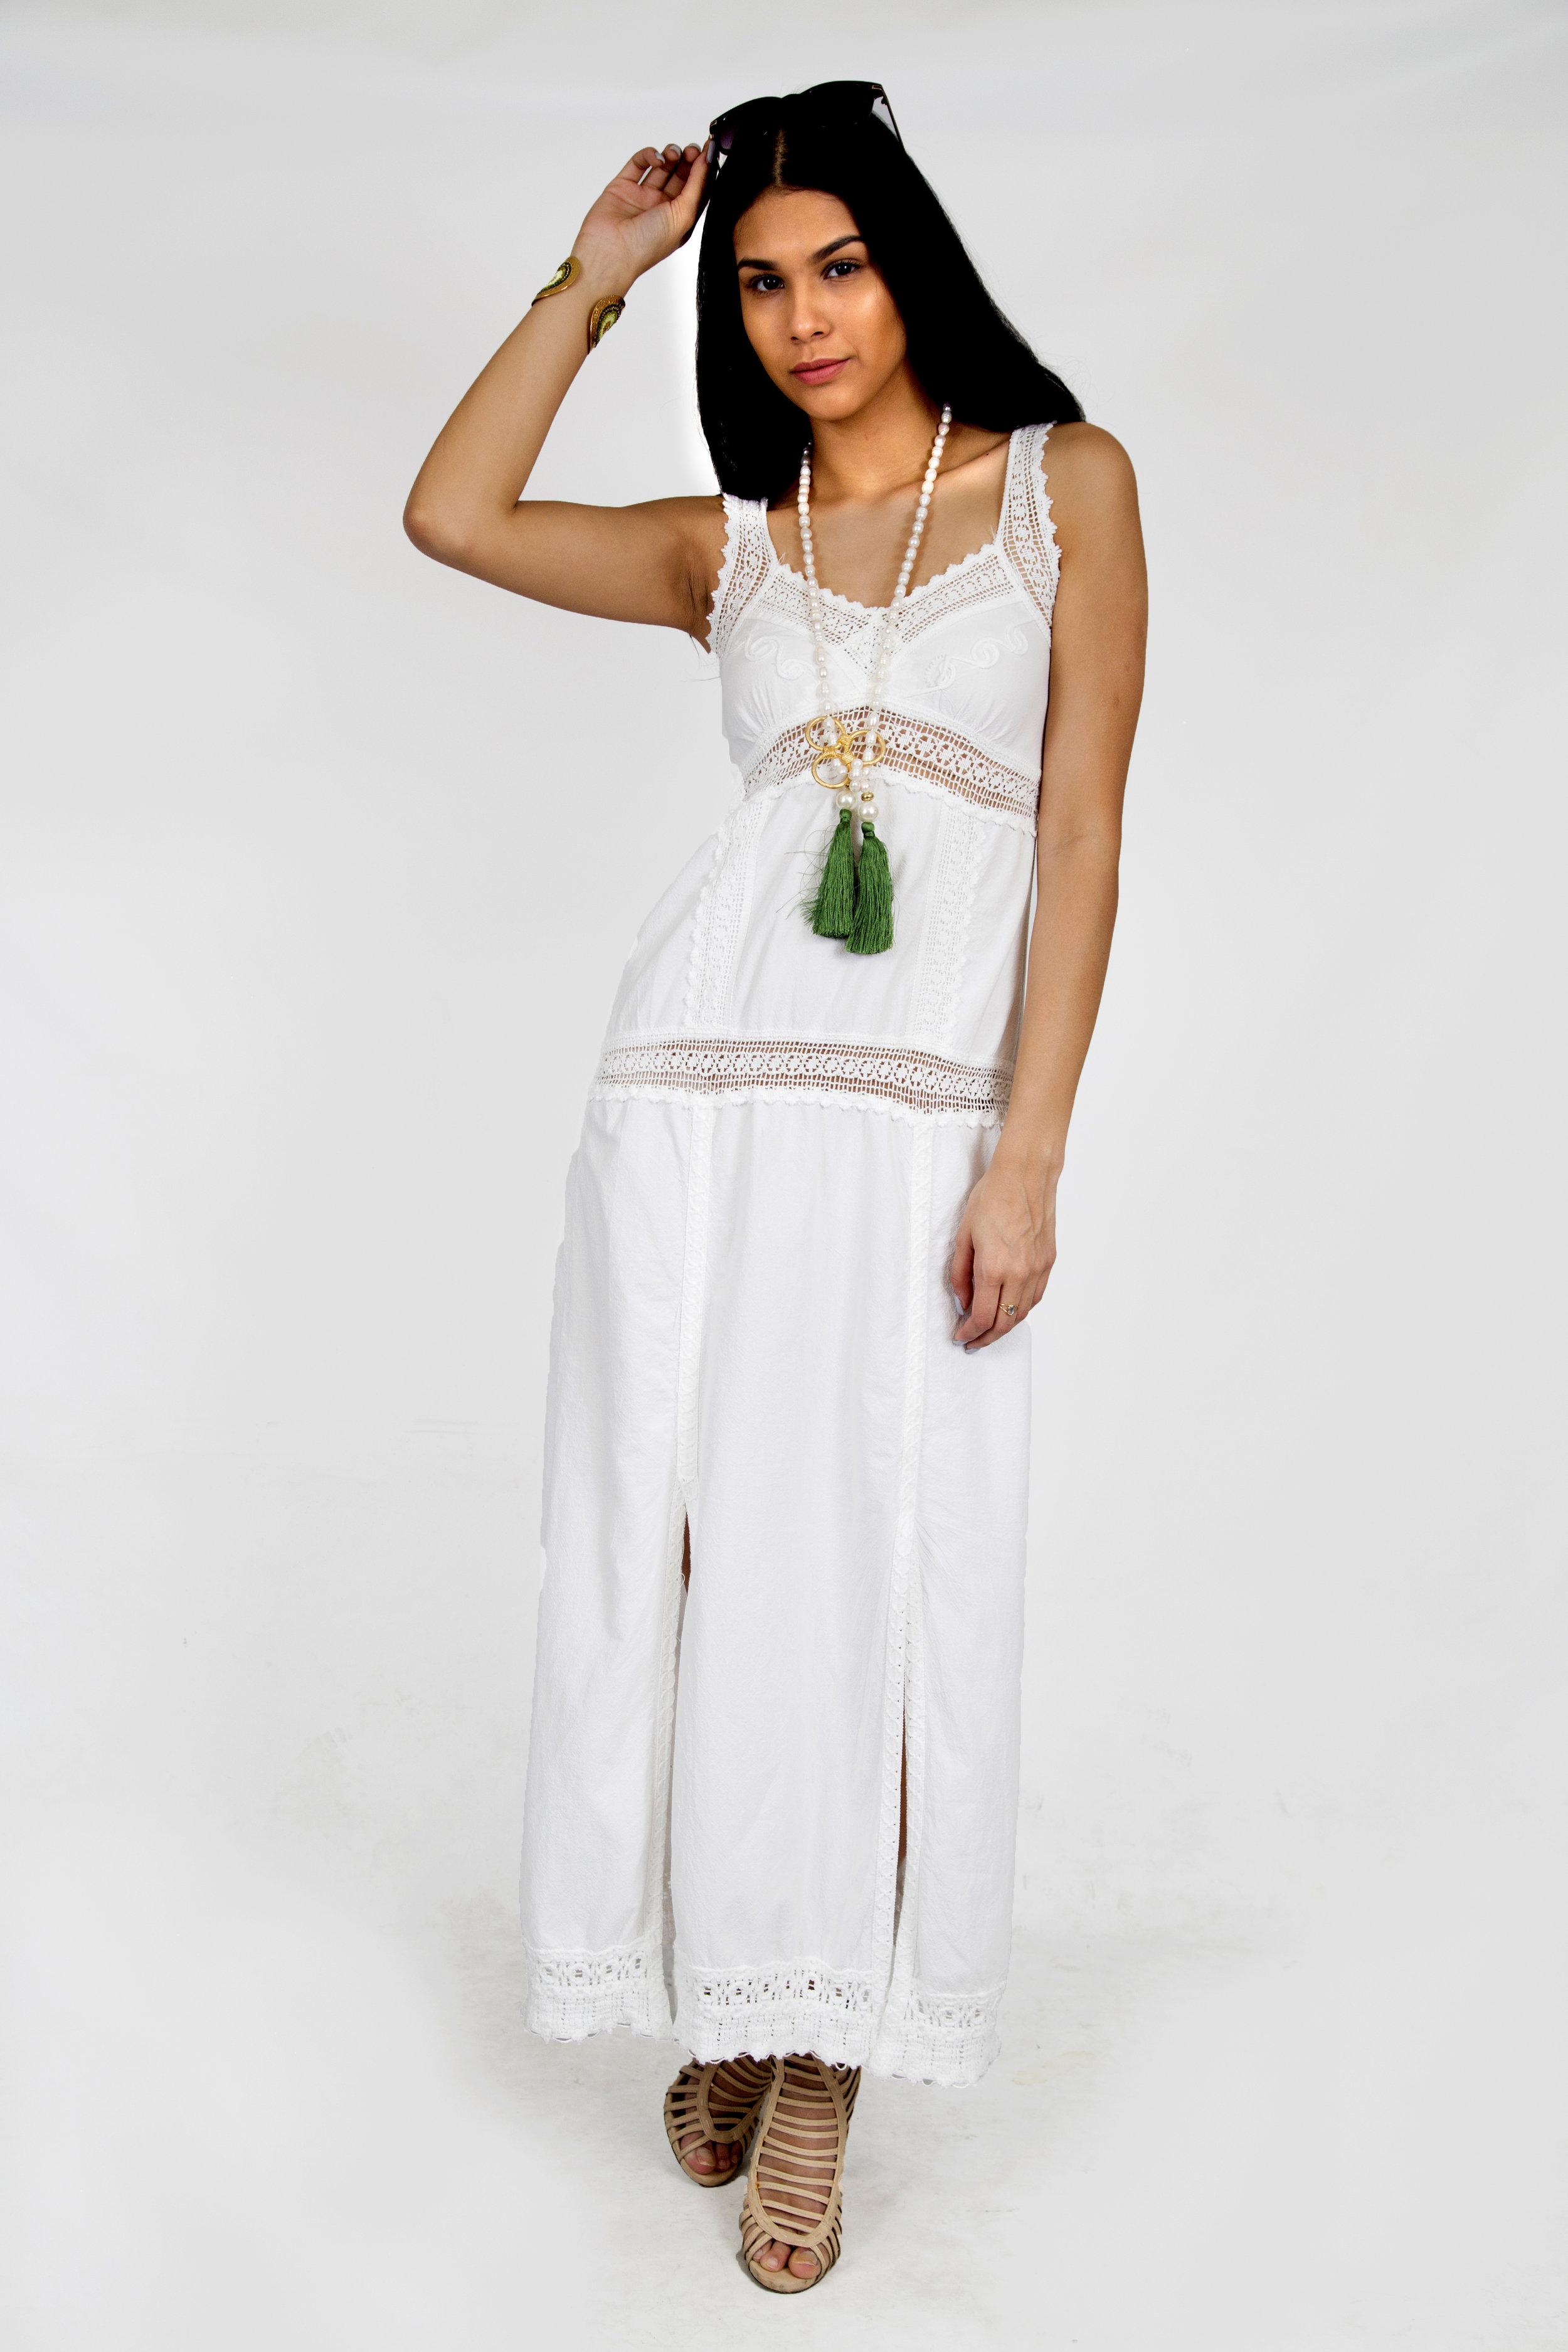 Summer Cotton Dress Dennise - Shop on Ebay